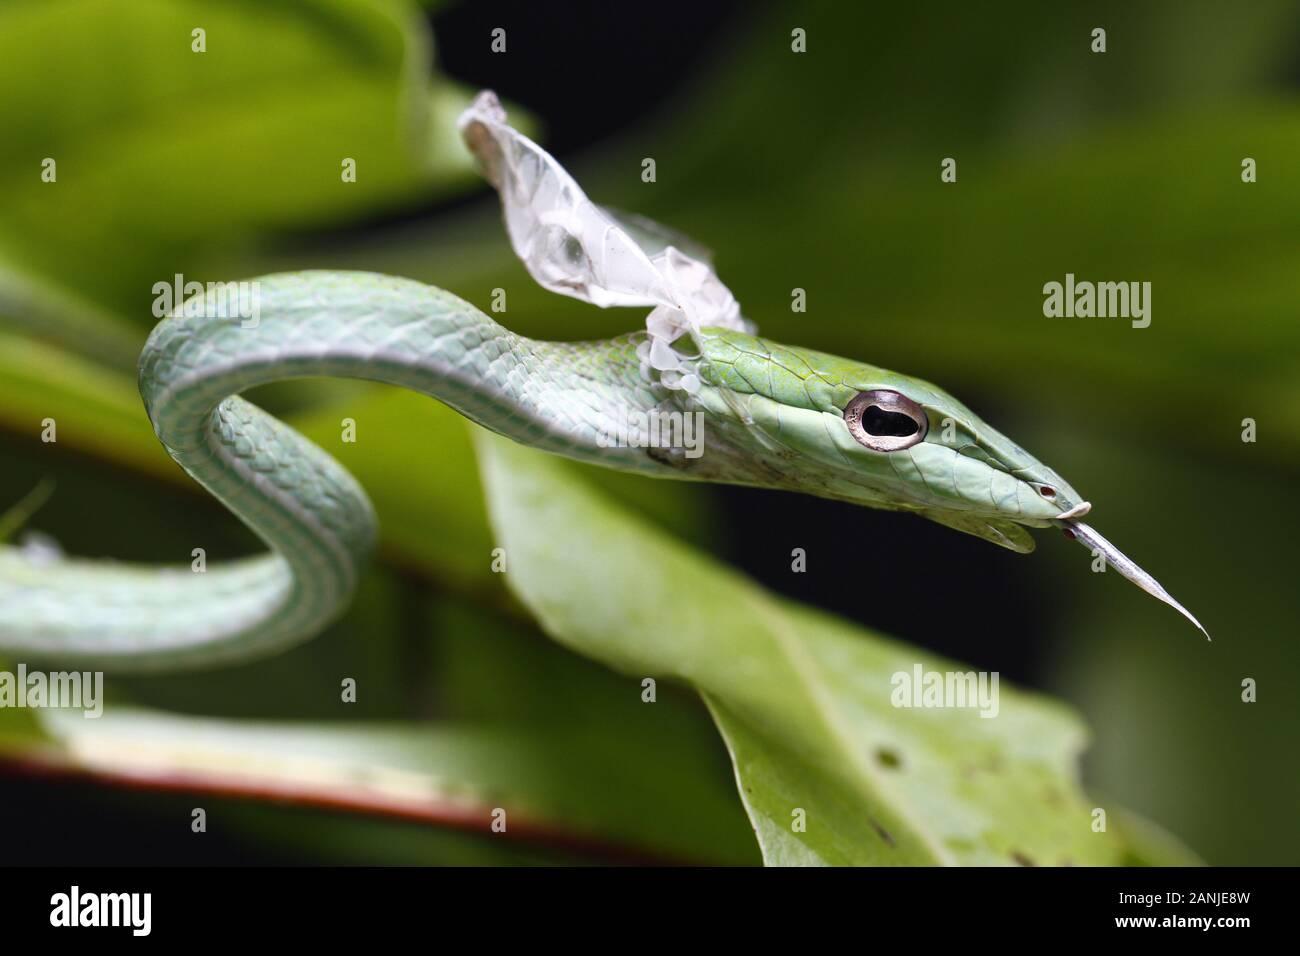 Close Up of Asian Vine Snake (Ahaetulla prasina) Shedding it's Skin. Stock Photo